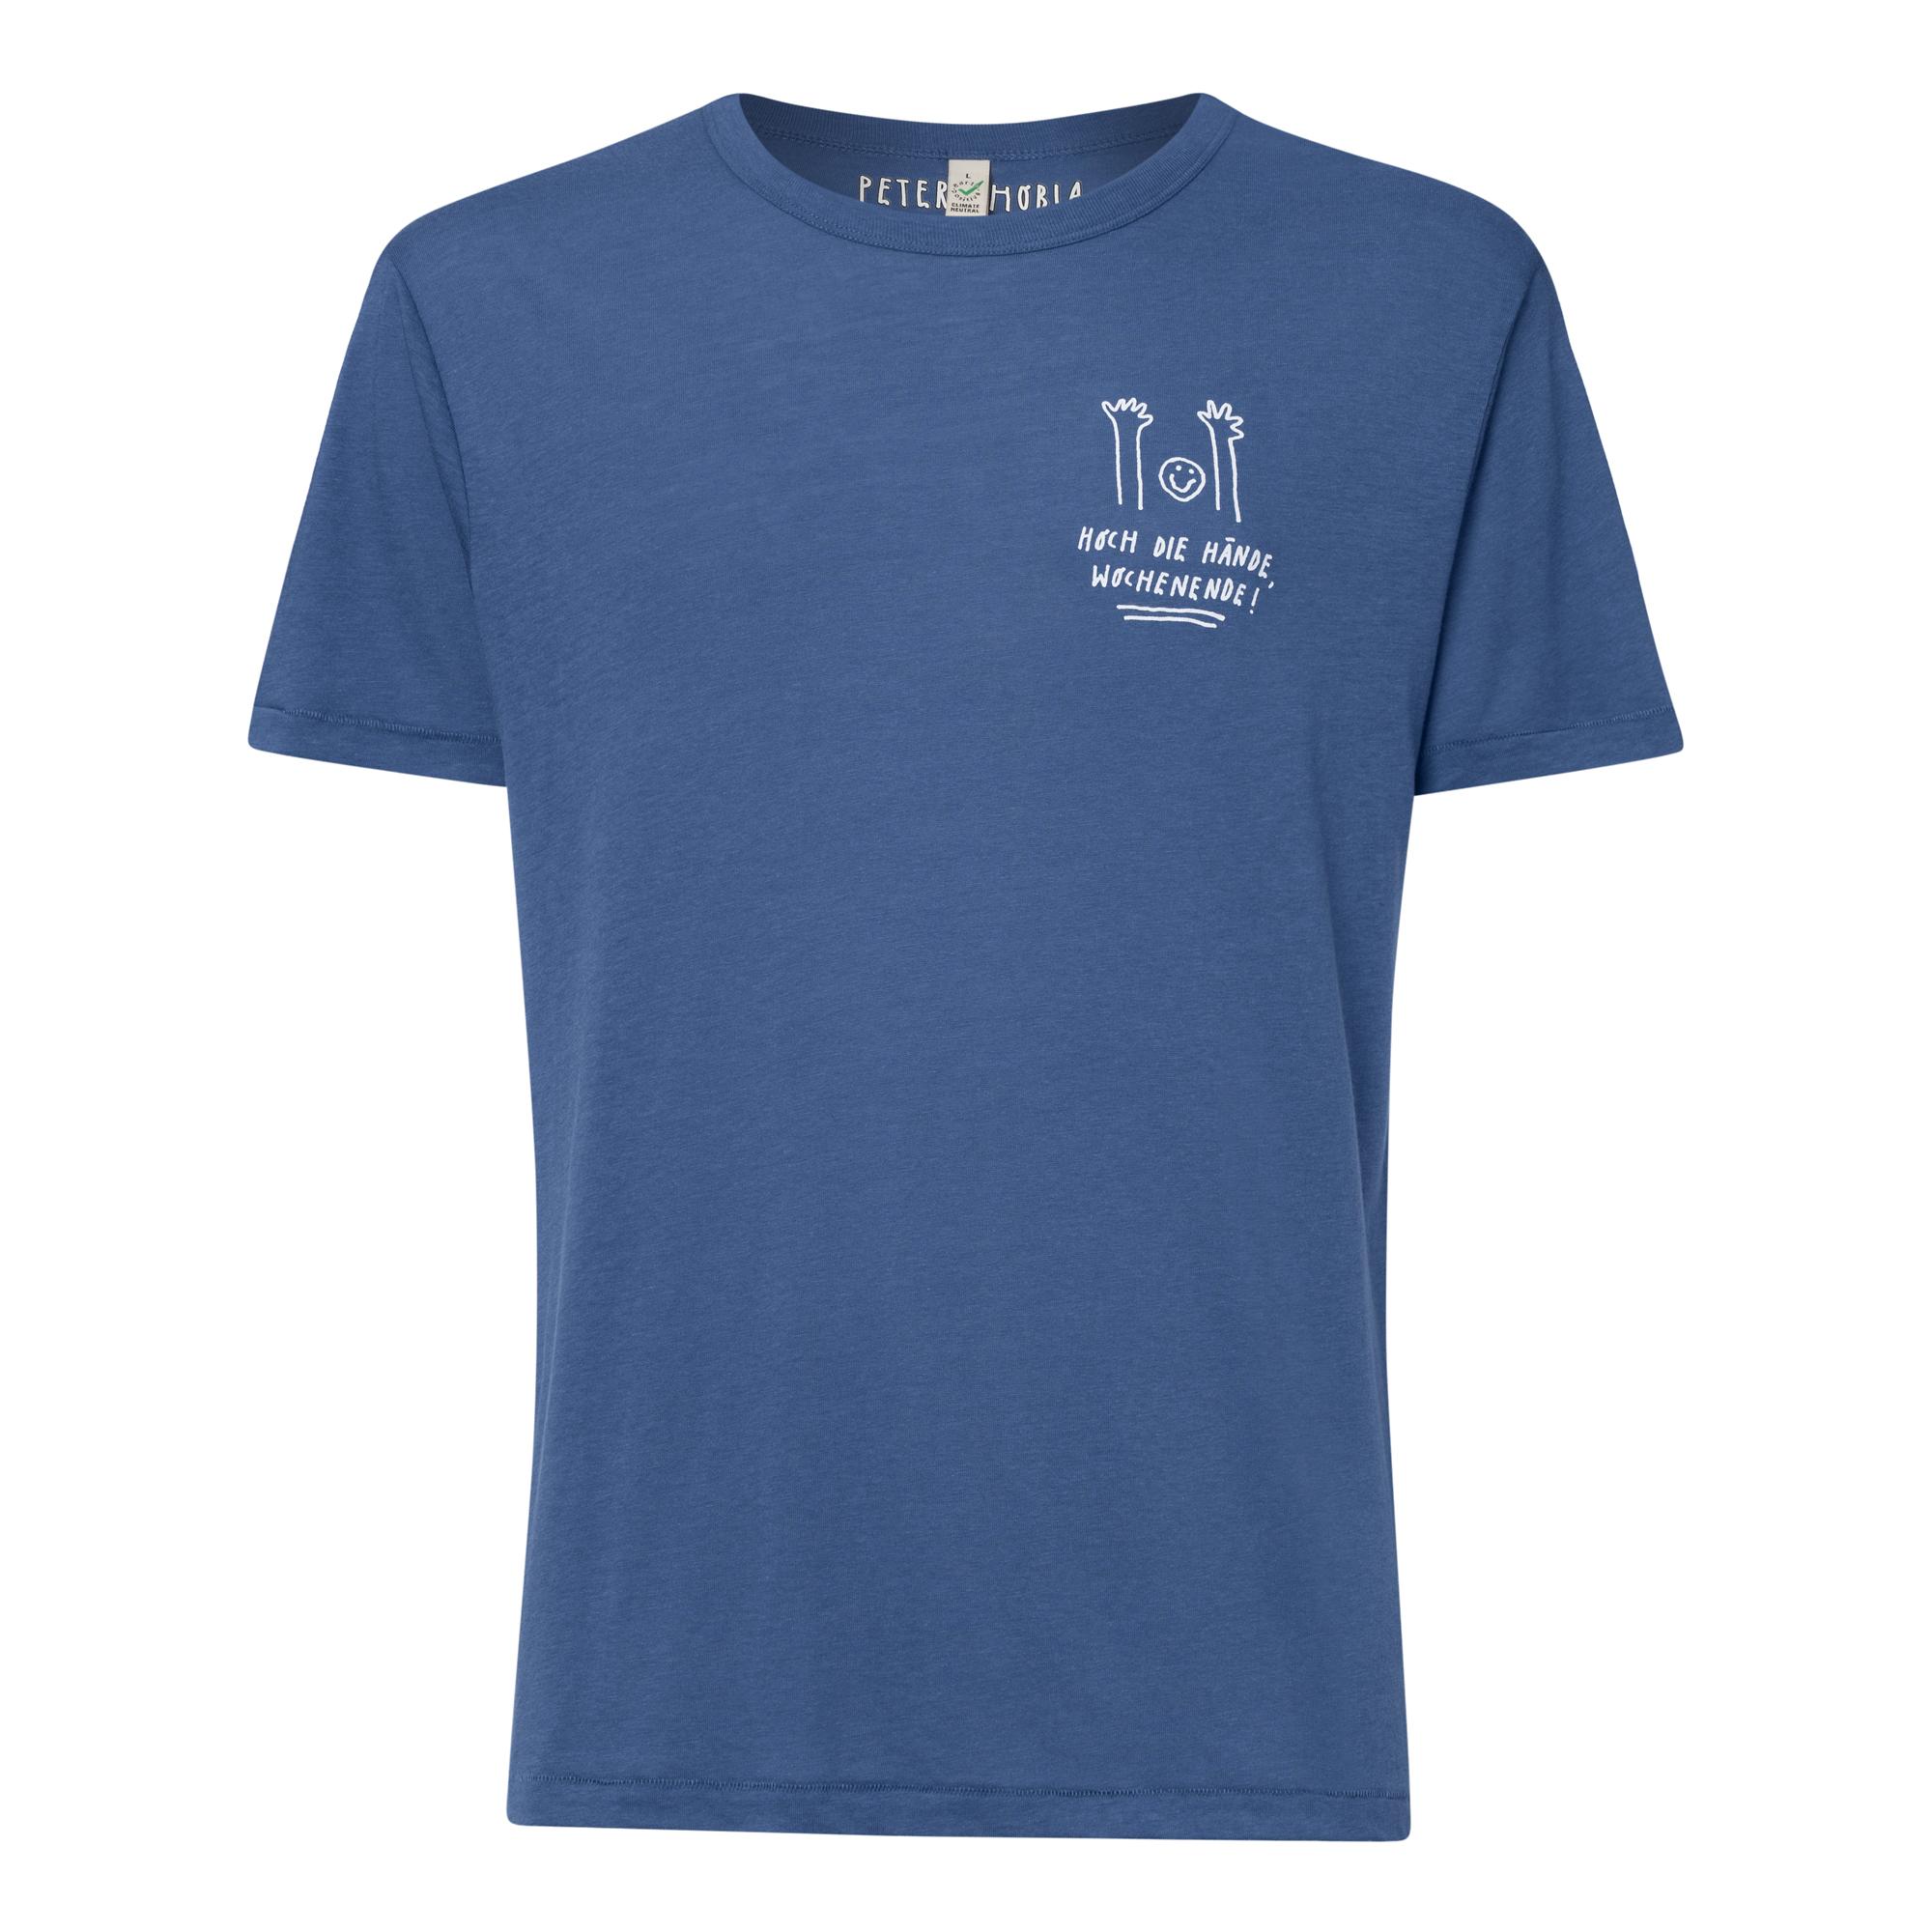 Peter-Phobia-Hoch-Die-Haende-Tencel-T-Shirt-Man-whit.jpg